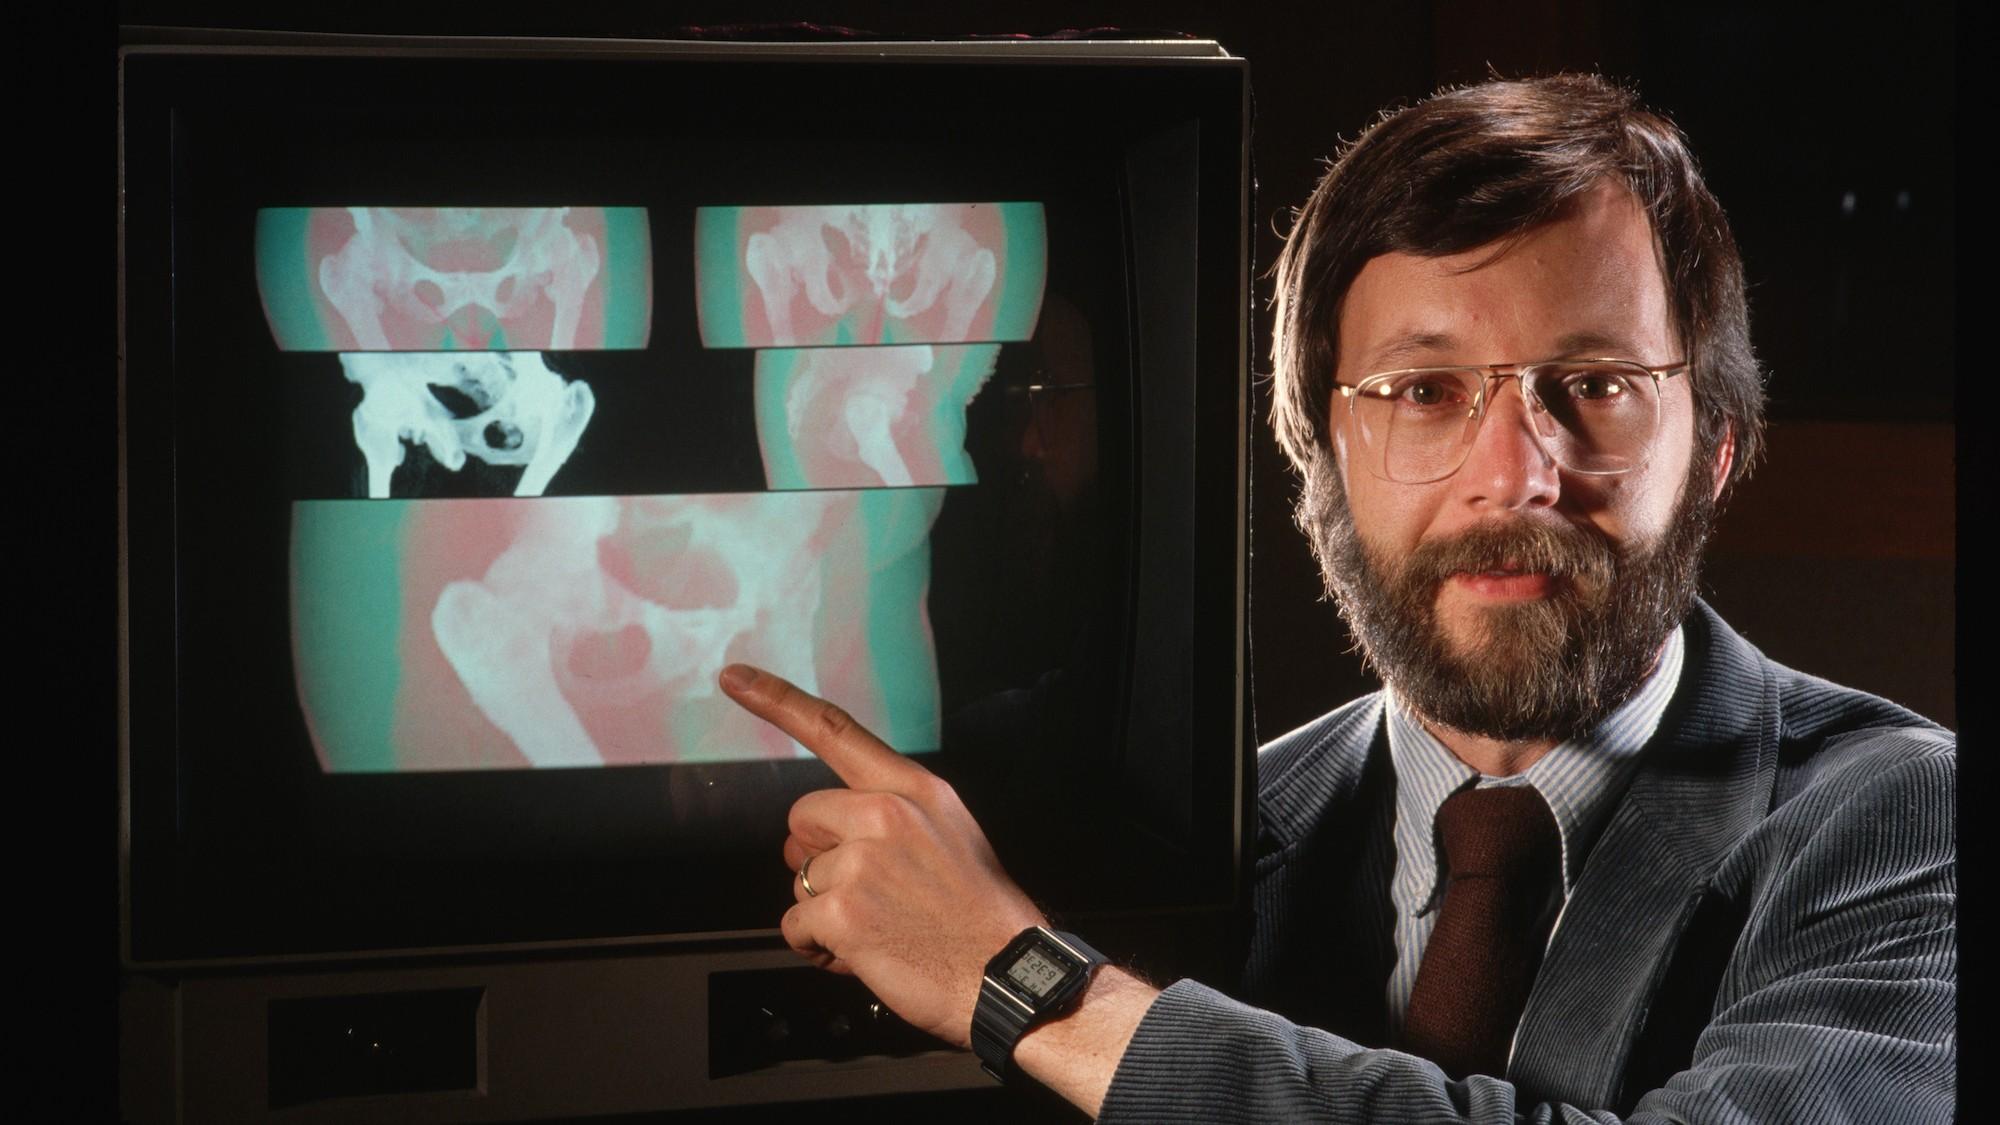 Pixar's 1986 Imaging Computer Was So Advanced, It Changed Medicine